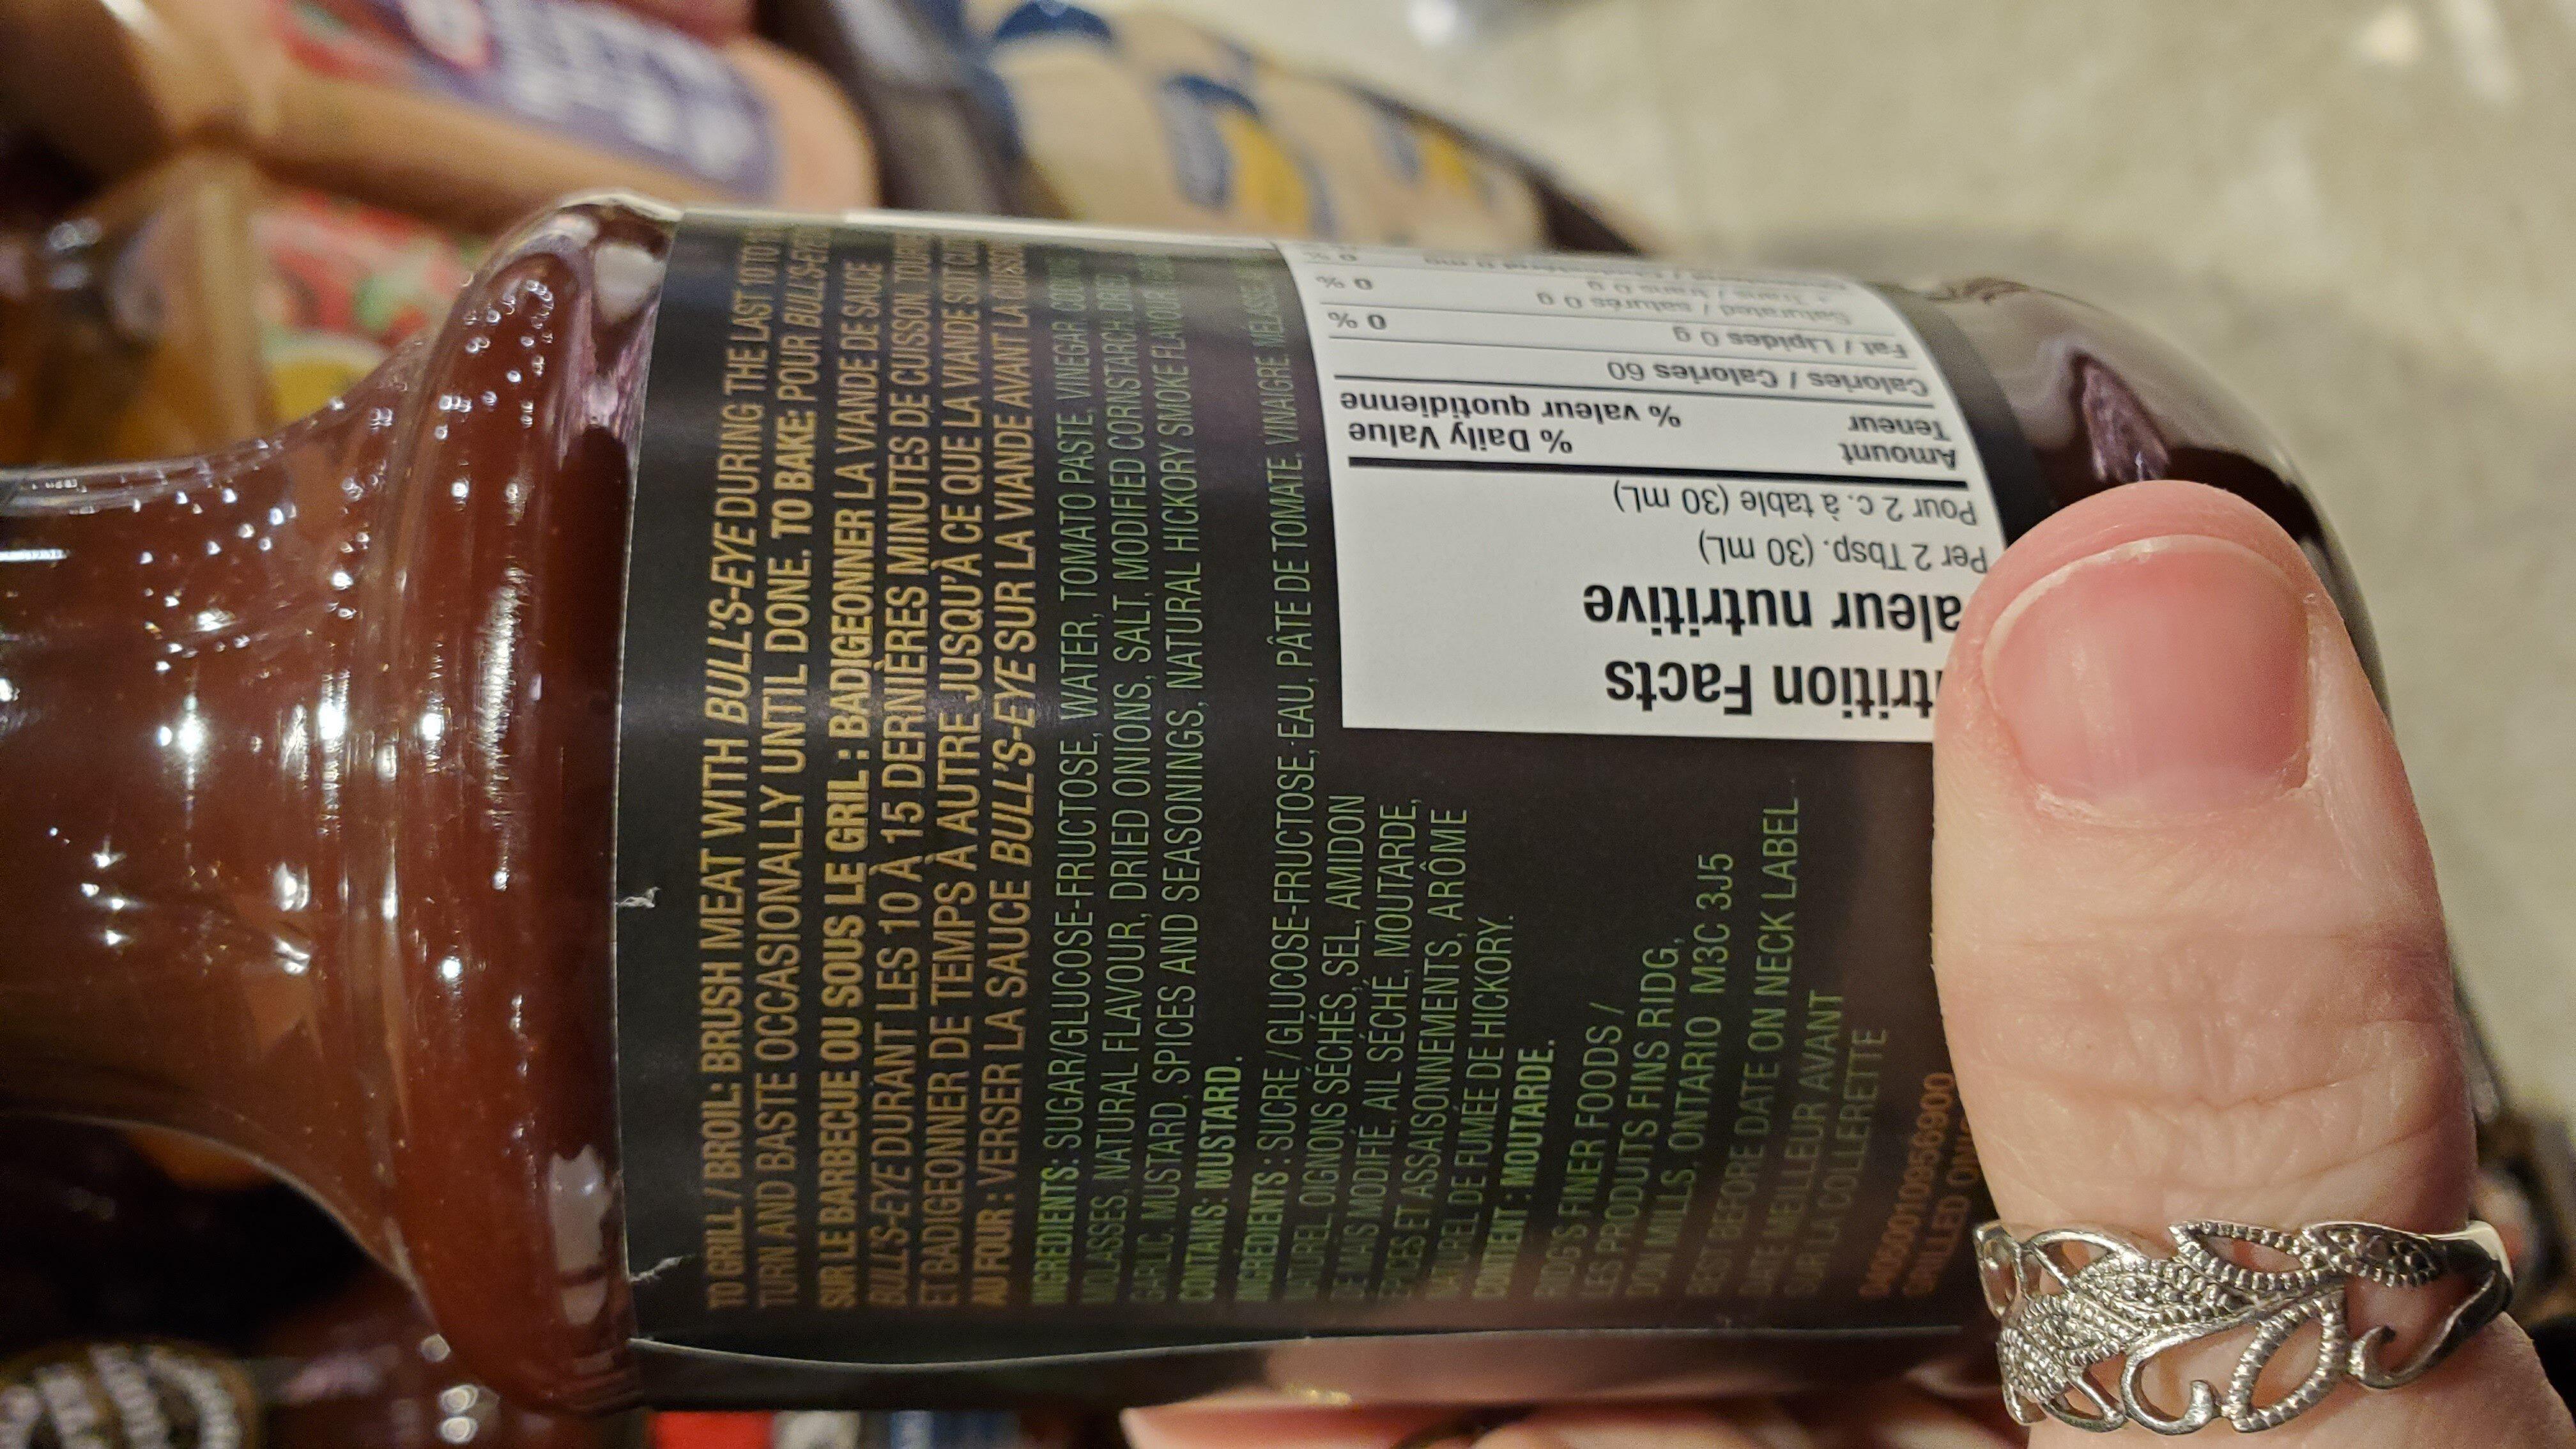 bbq sauce - Ingrediënten - en